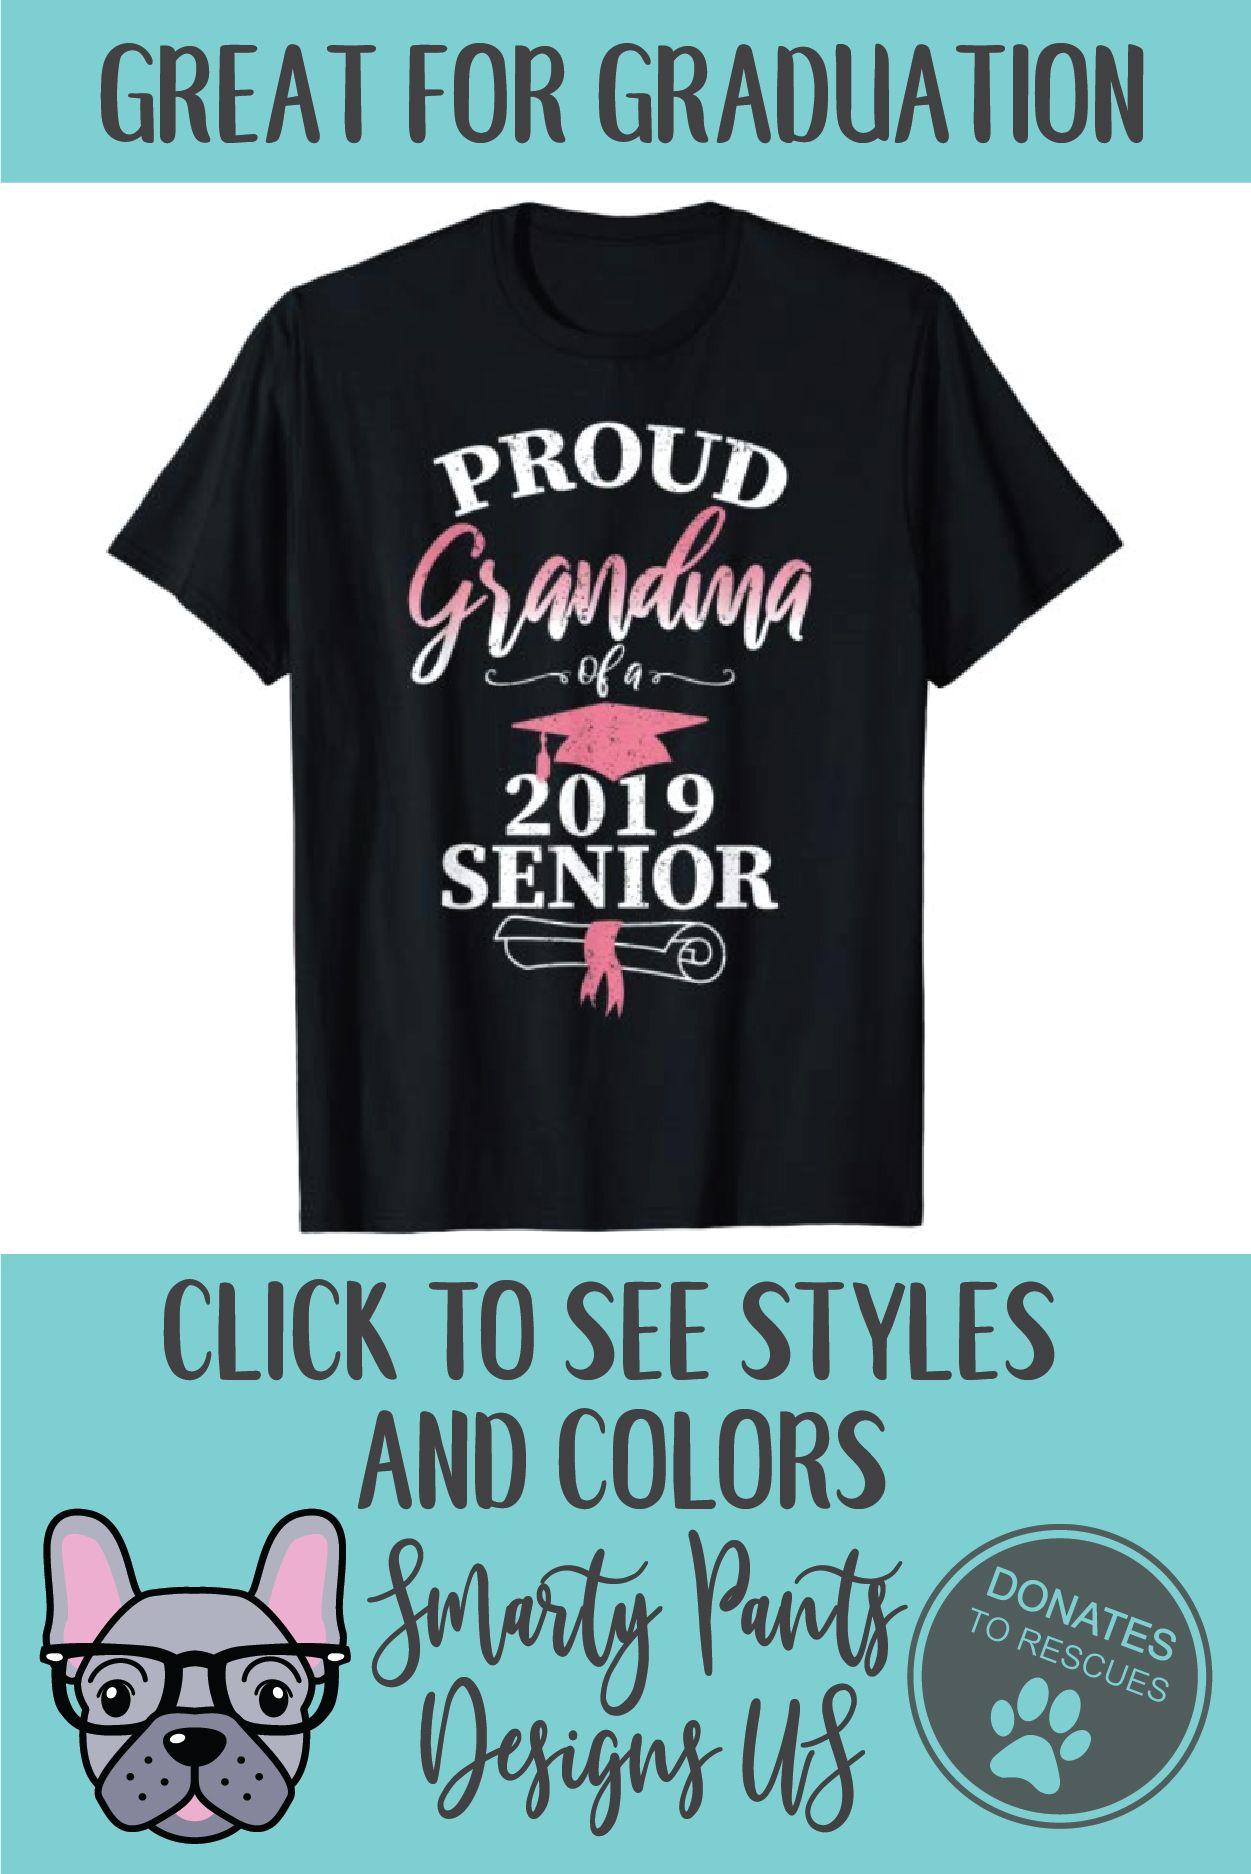 e488c26ca Class of 2019 Graduation shirt for grandmothers of graduates. Special  design for all proud Grandmothers